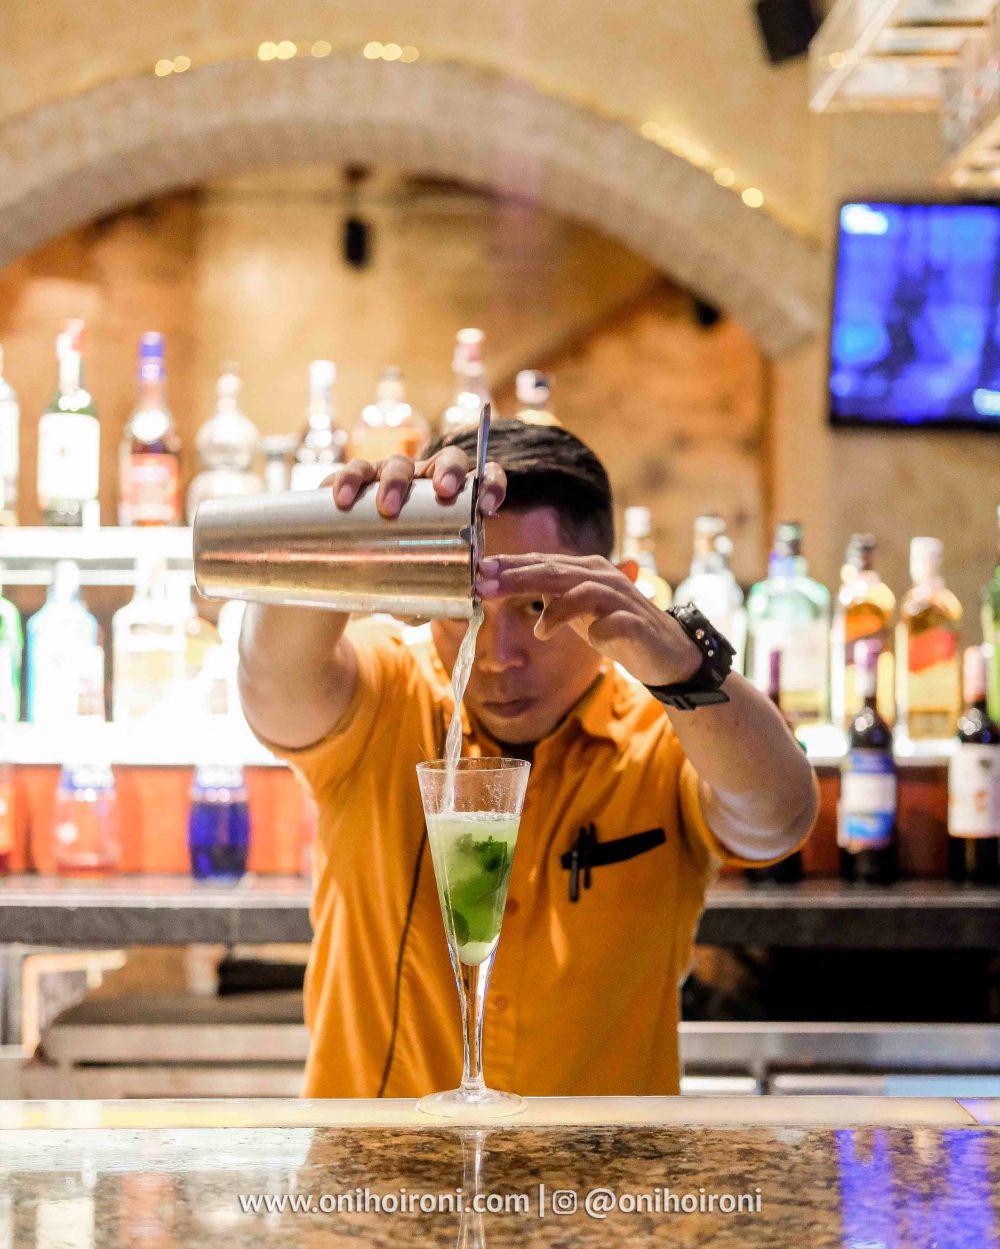 1 Review Desparado Lounge Shangrila Surabaya Hotel Oni hoironi